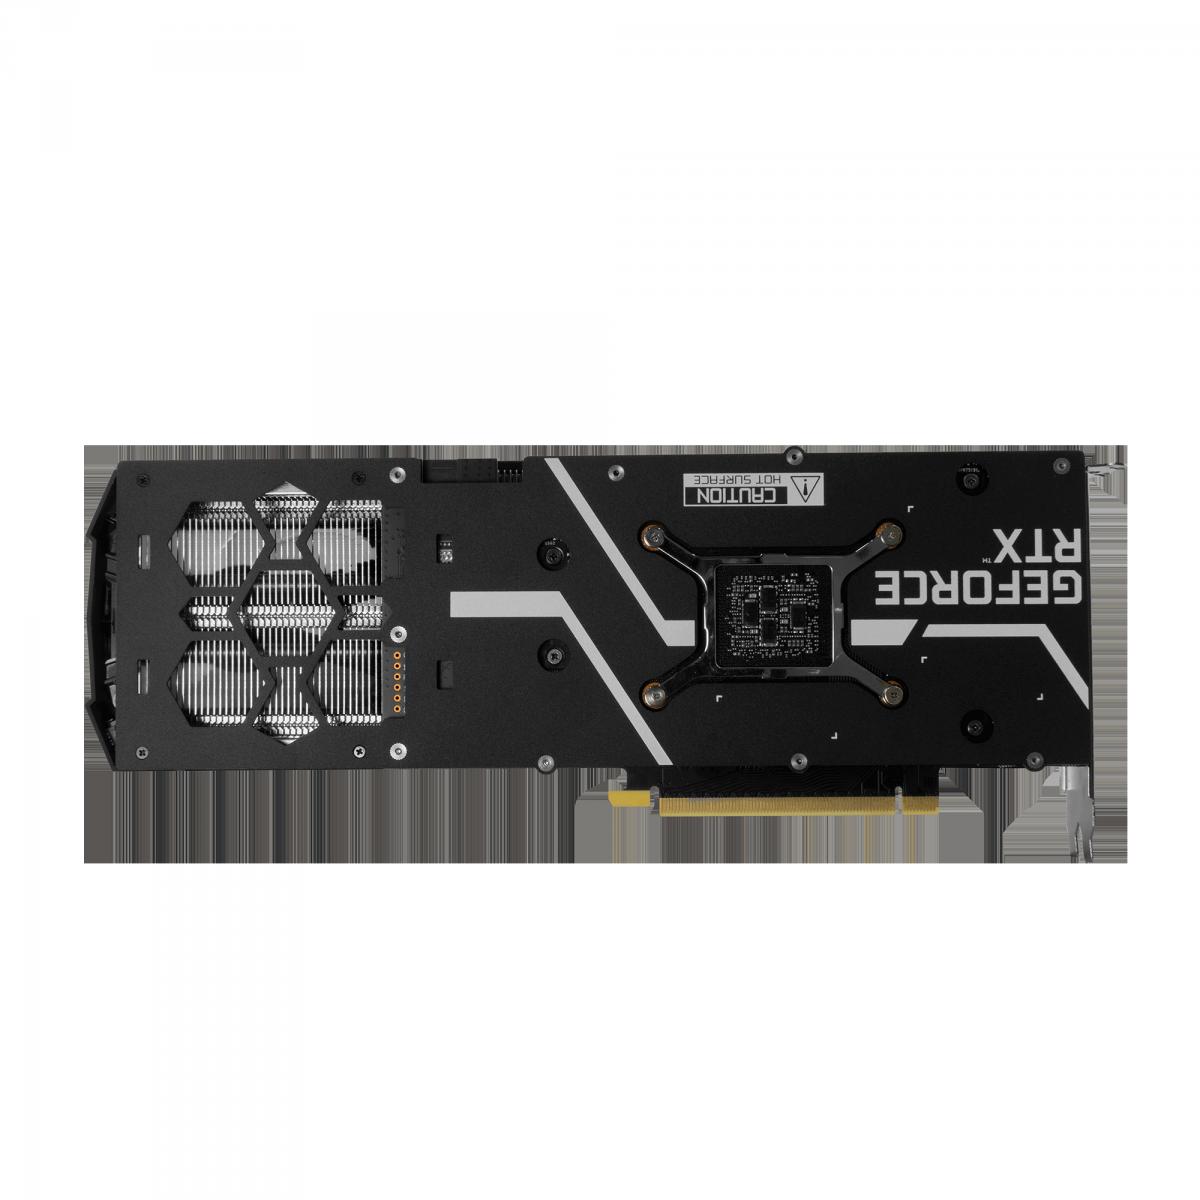 Placa de Vídeo Galax, GeForce, RTX 3070 SG, 1 Click OC, 8GB, GDDR6, 256Bit, 37NSL6MD1GNA